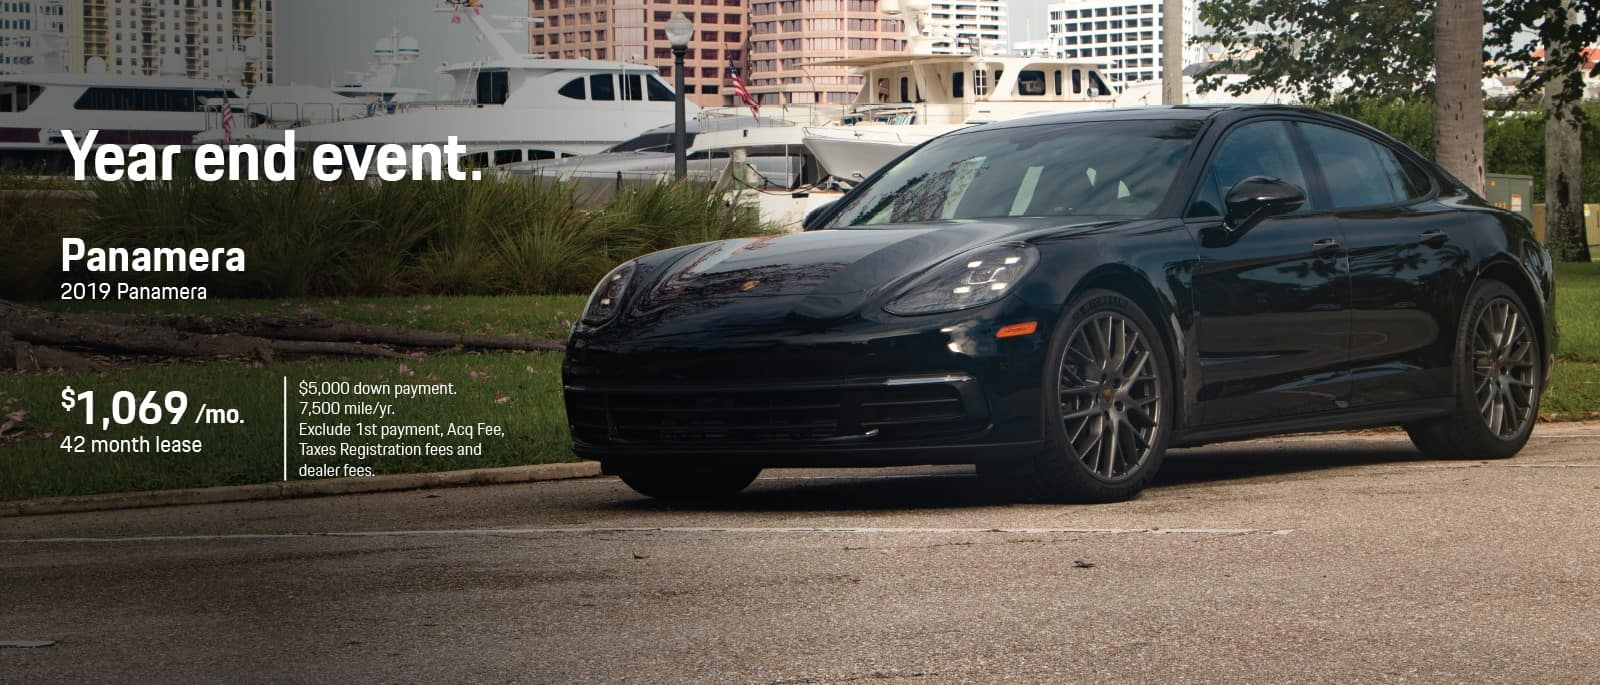 2019 Porsche Panamera Lease In Florida